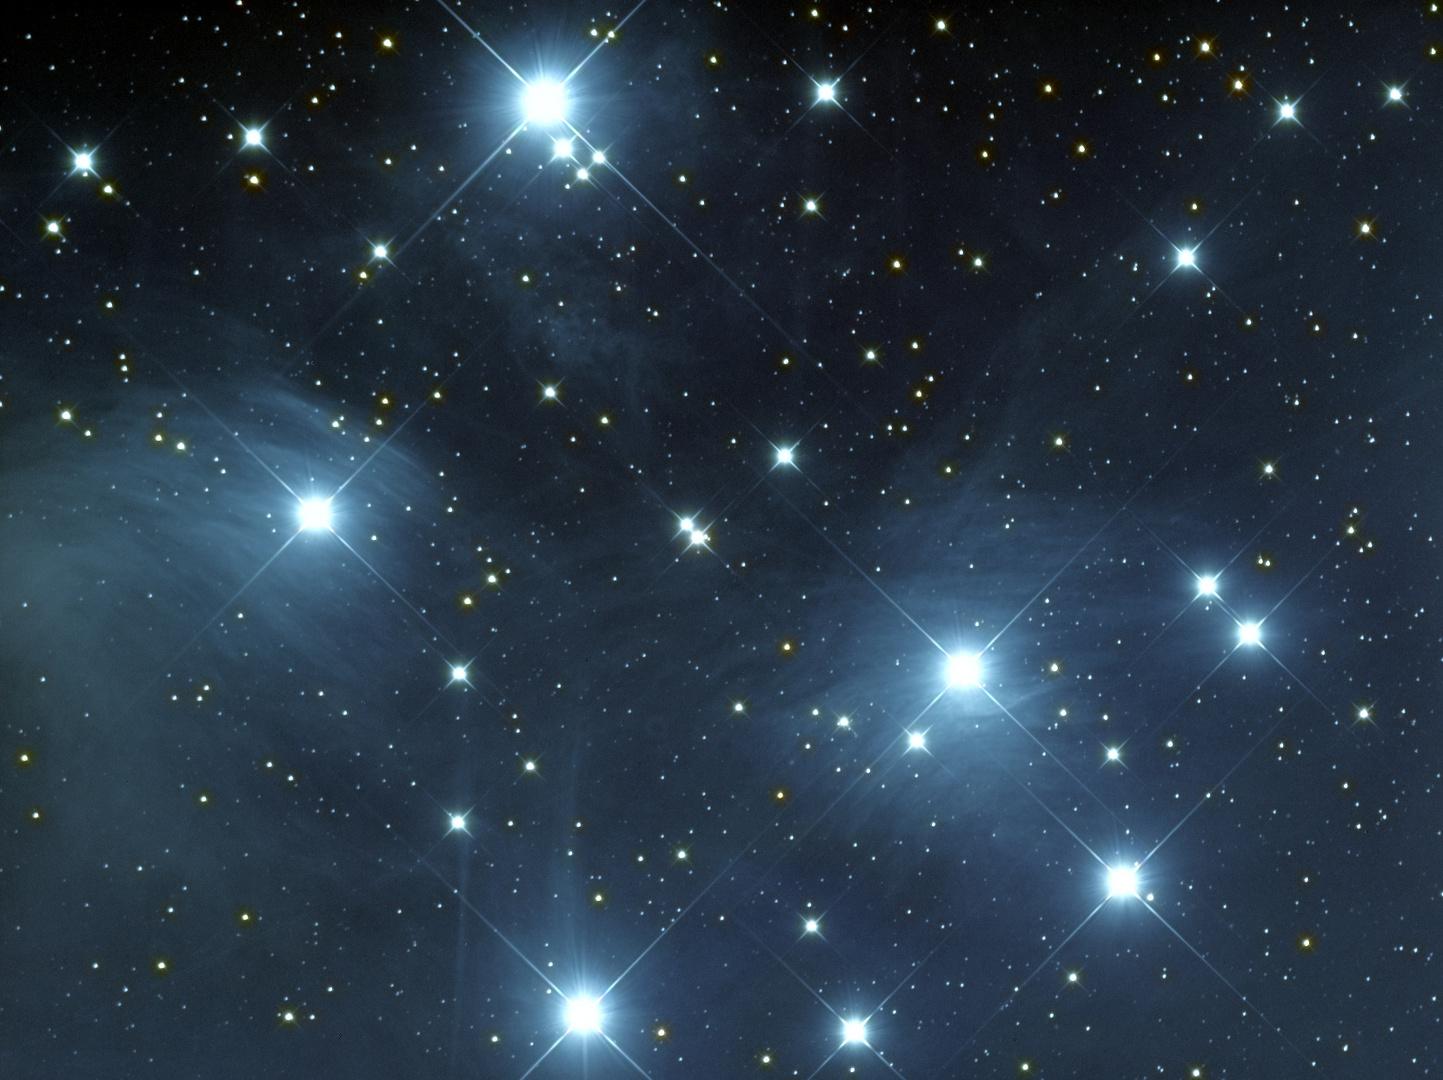 close up der Plejaden (Messier 45)